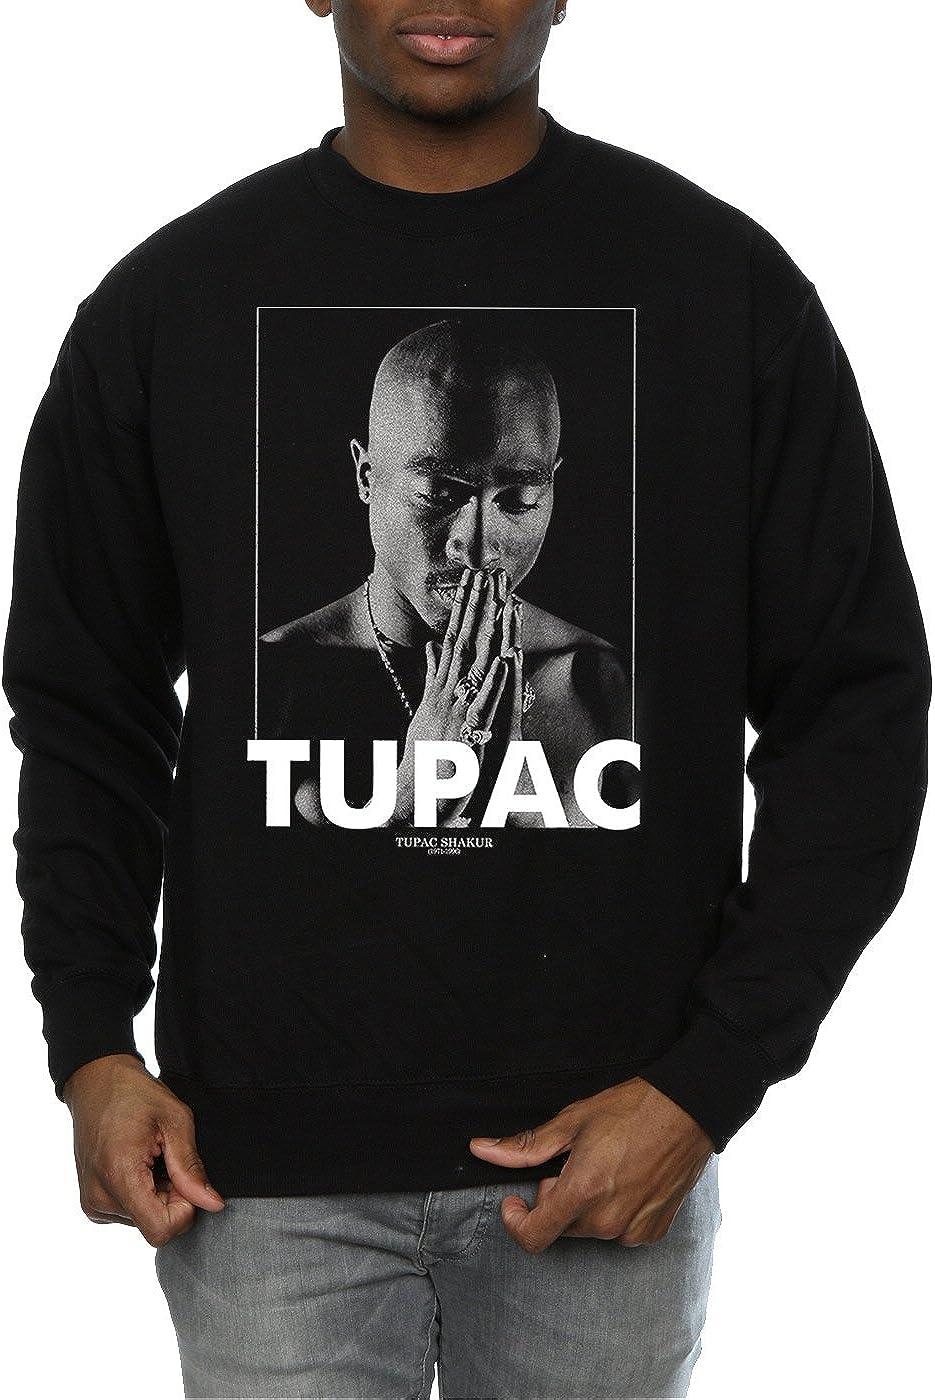 2Pac Herren Tupac Shakur Praying Sweatshirt XX-Large Schwarz